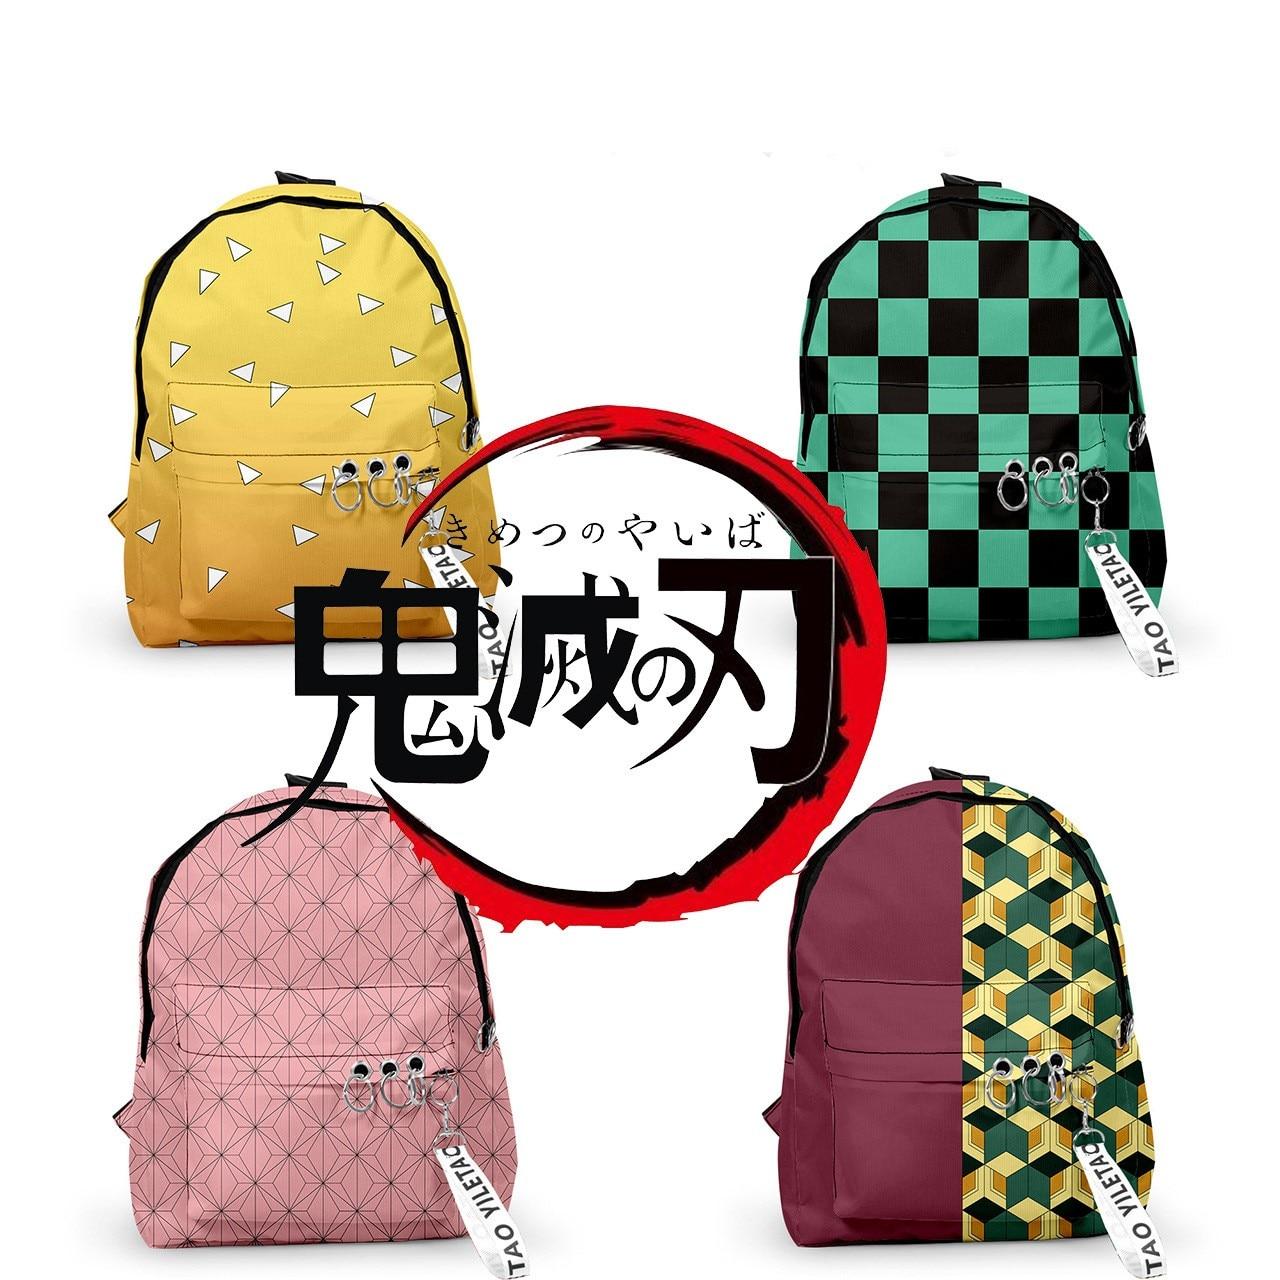 Cartoon Anime Demon Slayer Kimetsu No Yaiba Cosplay Student School Backpack Fashion Travel Knapsack Shoulder Bag Satchel Package